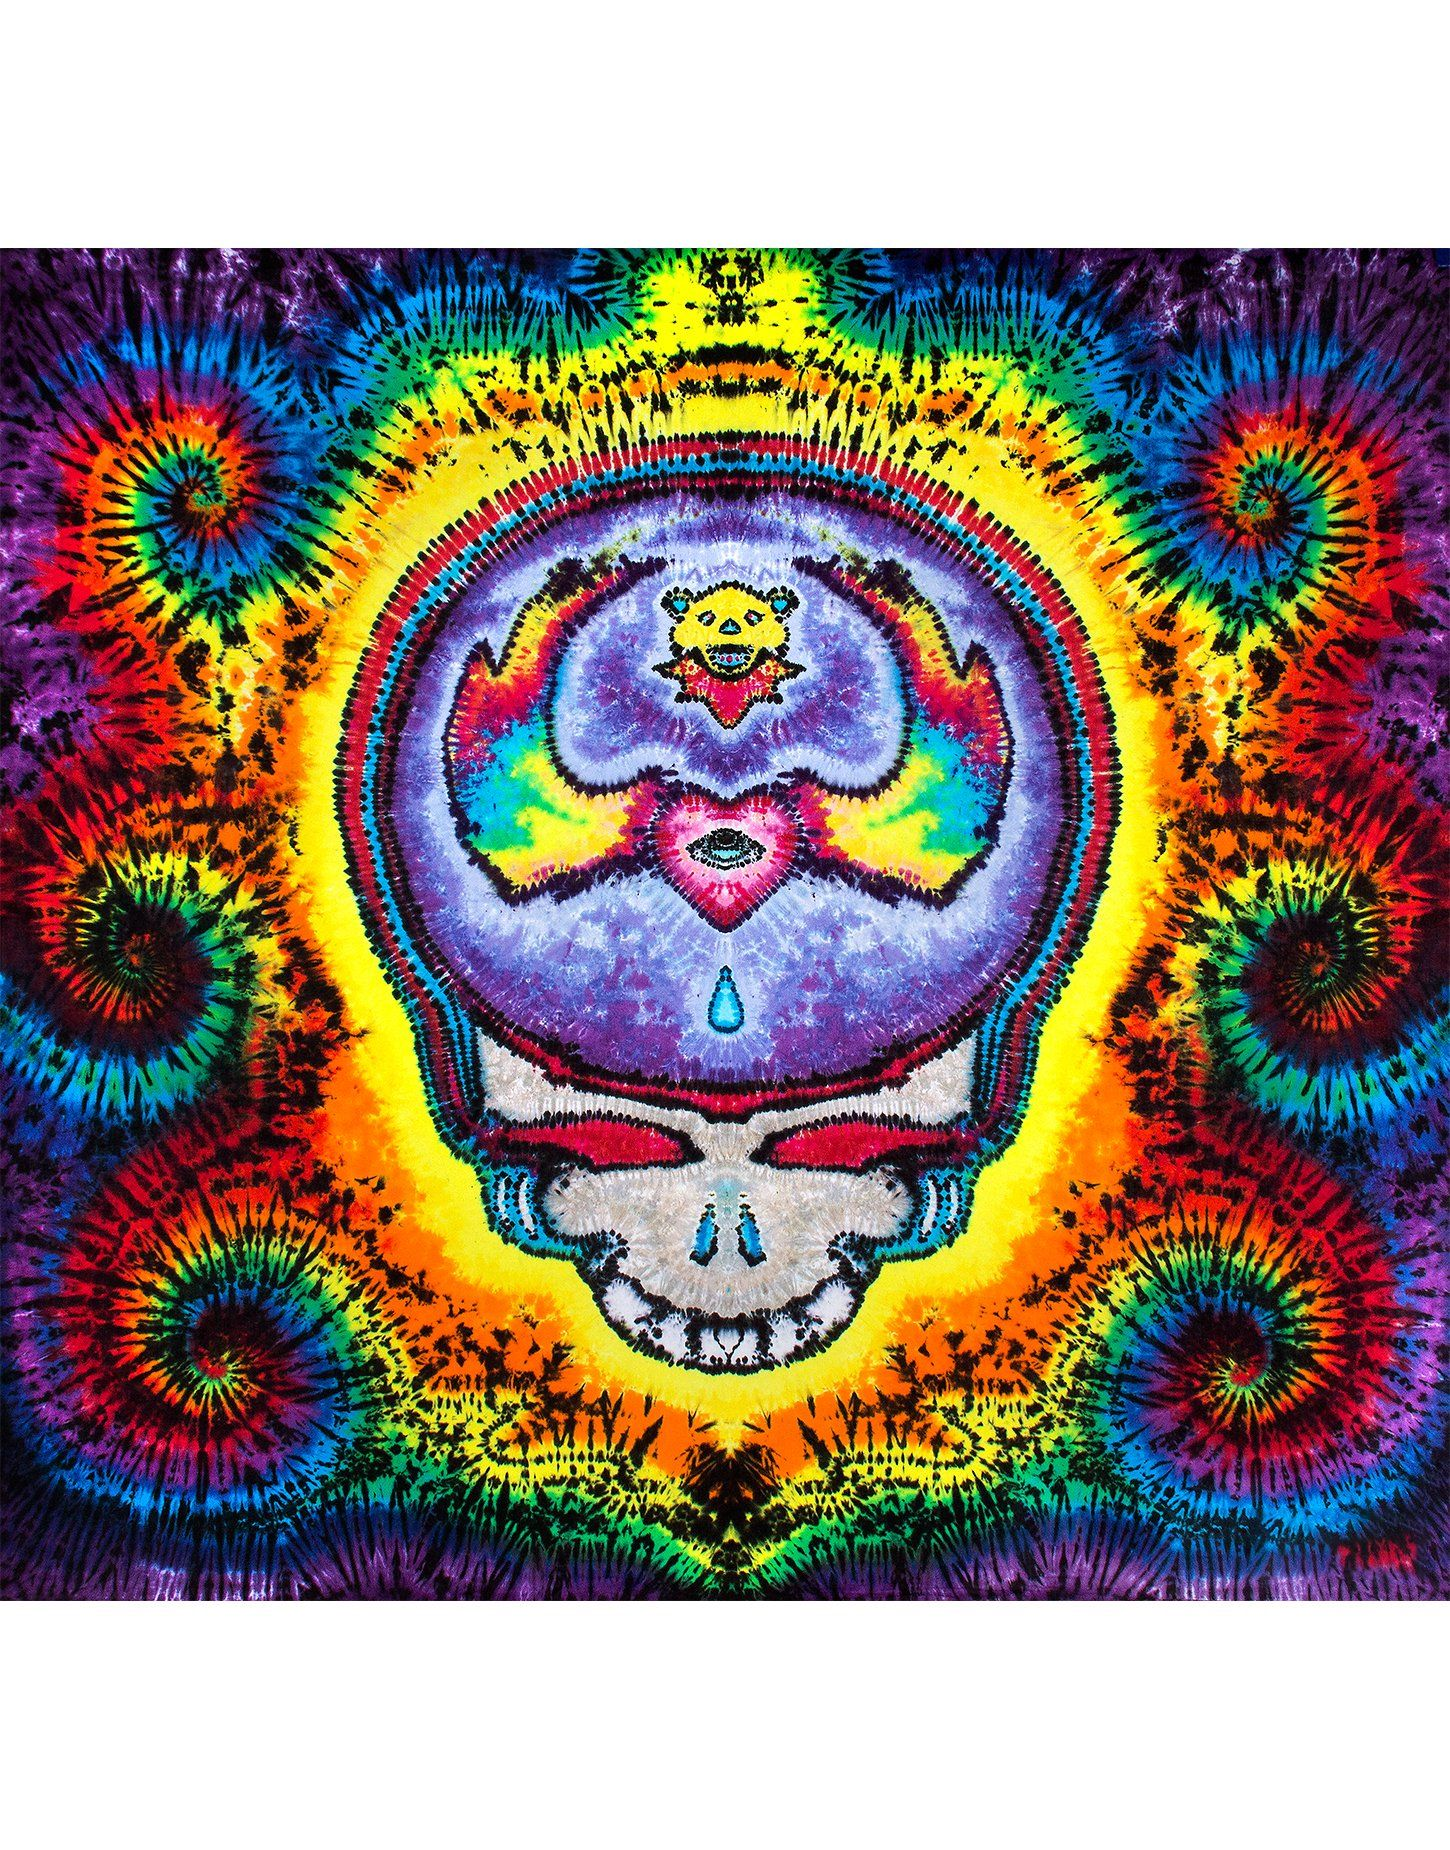 Jammin Stealie Tapestry Tapestry, Tie dye tapestry